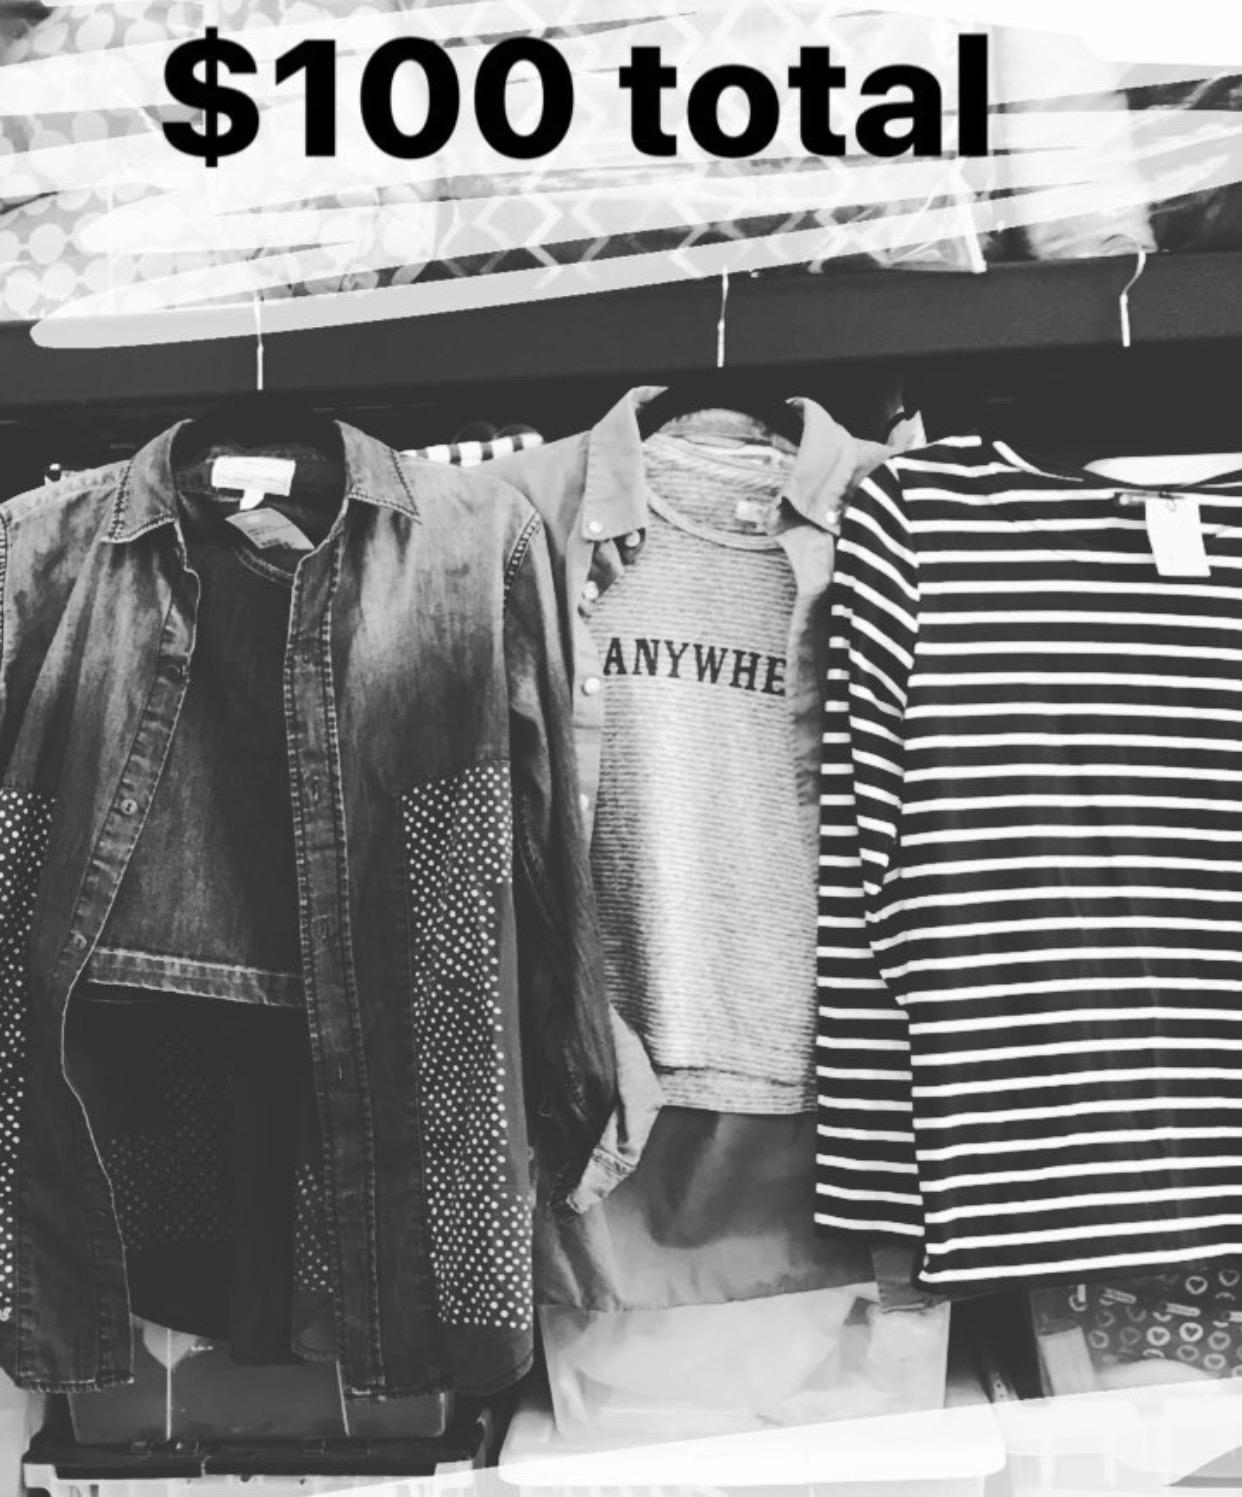 My thrift shopping haul: Marine Layer skirt, Current/Elliot denim shirt, SuperDry khaki shirt, Madewell tee, and Bateau Petit tee